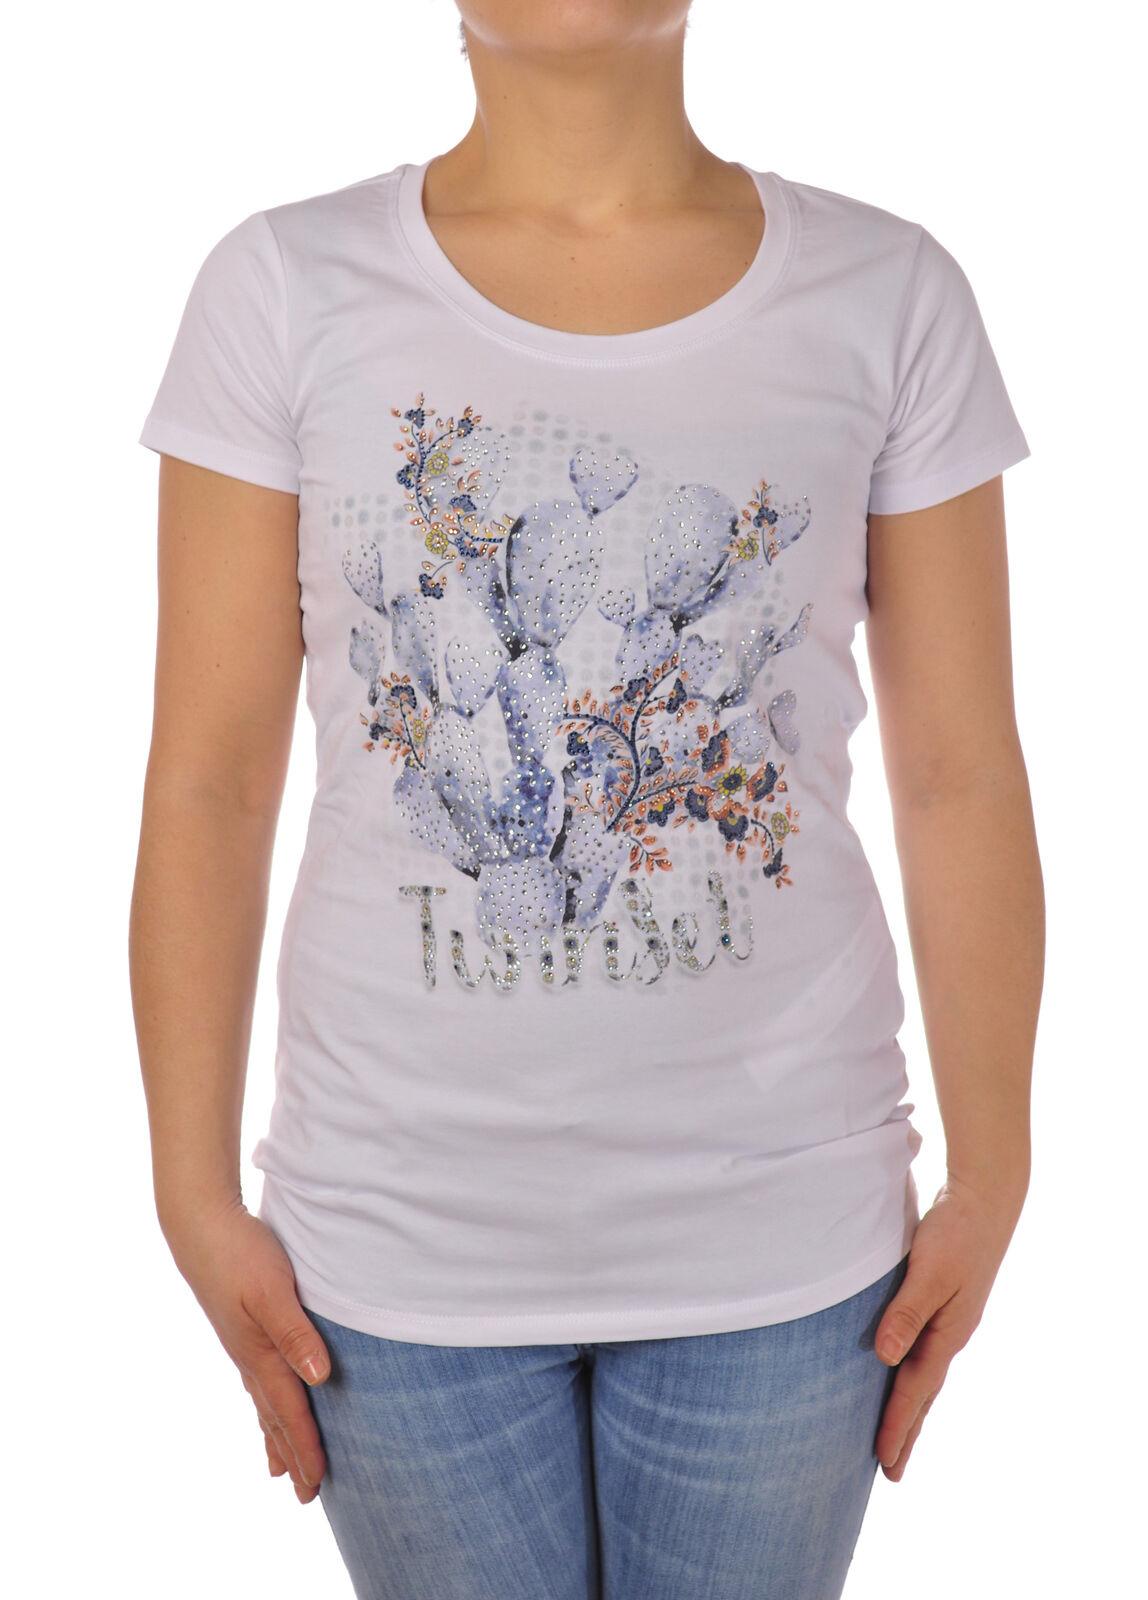 Twin Set - Topwear-T-shirts - Frau - Weiß - 5079202F184428